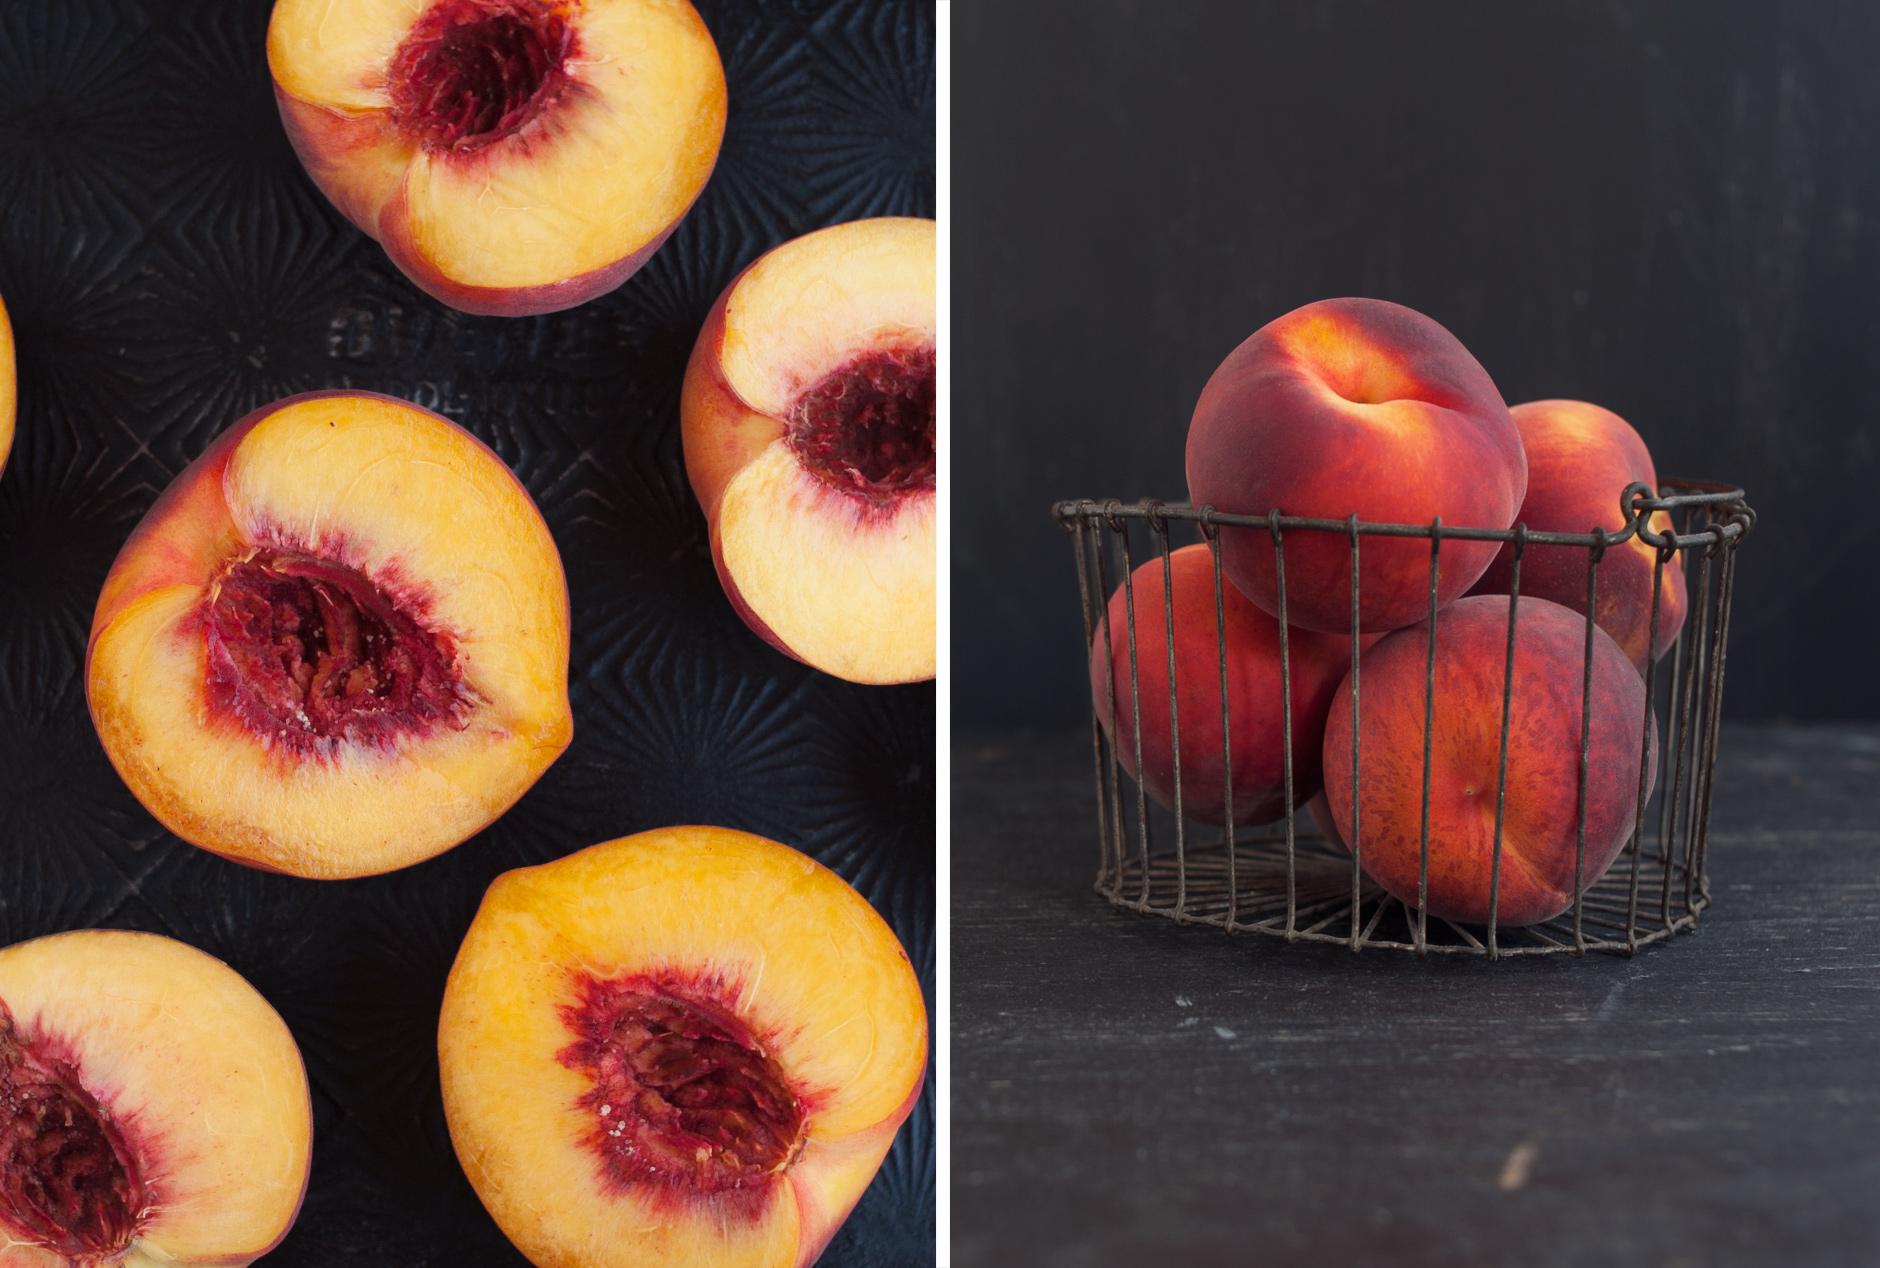 roasted_peaches_food_photography_3.jpg